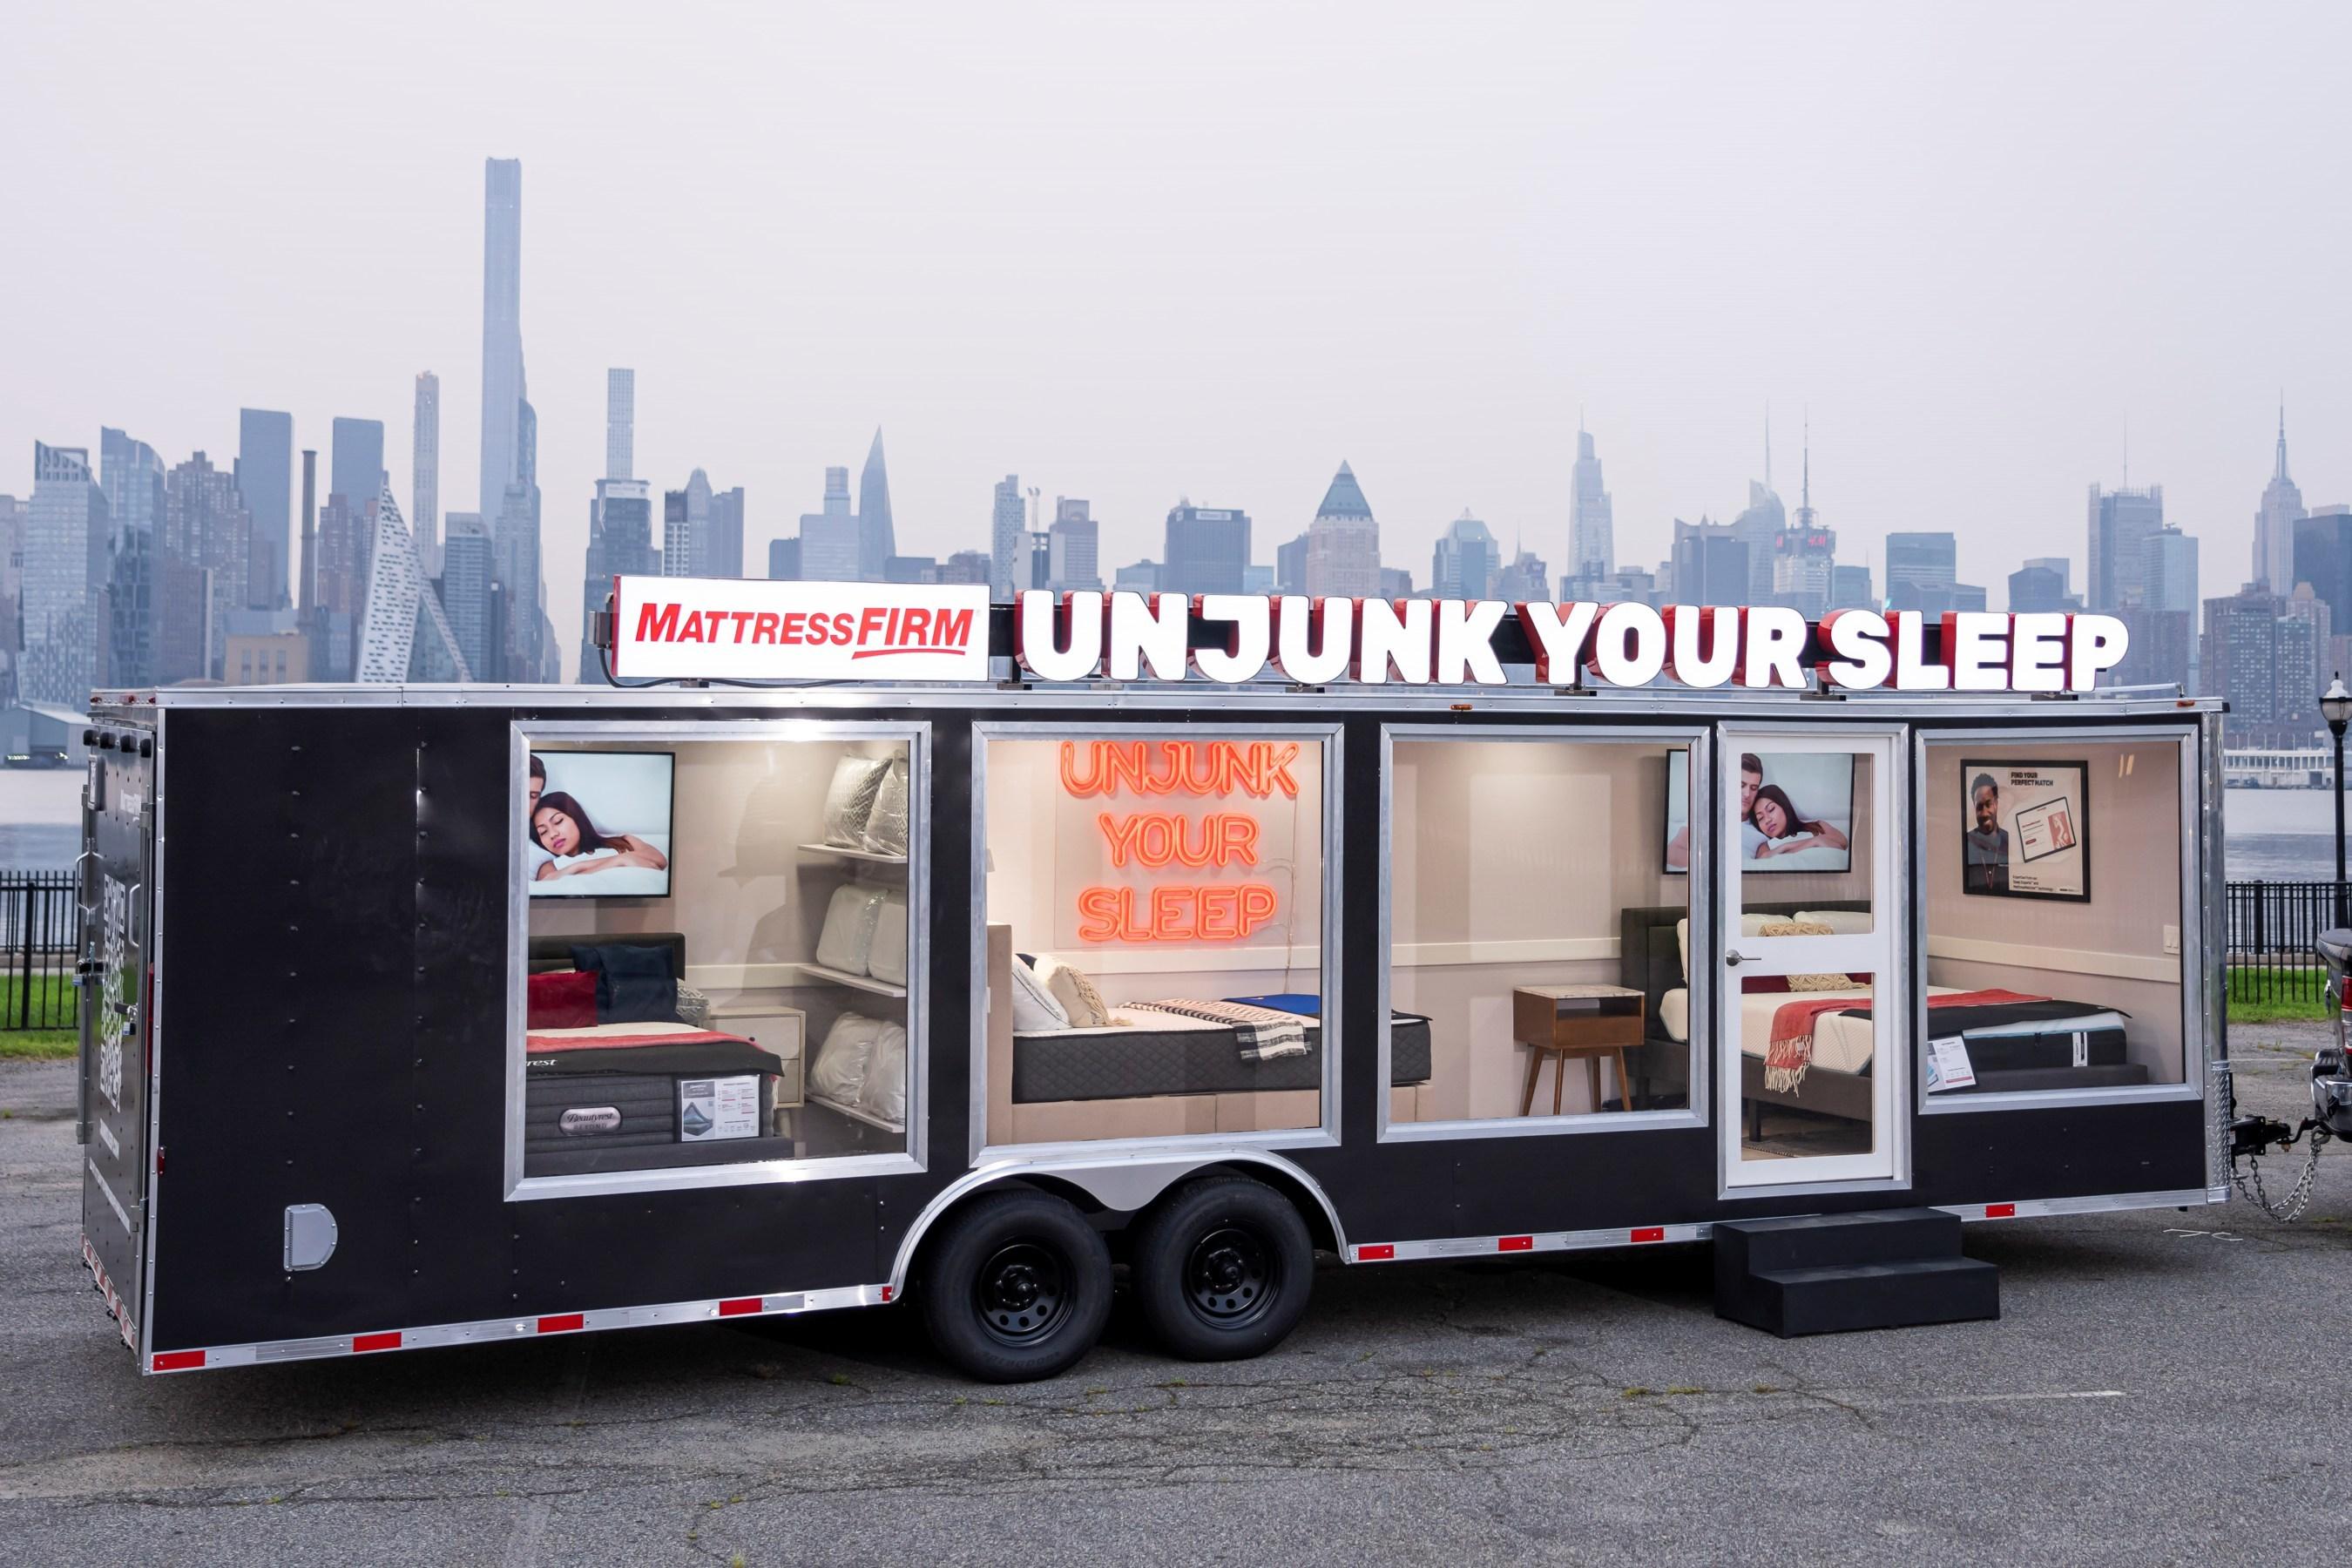 The Un-Junk Your Sleep Truck